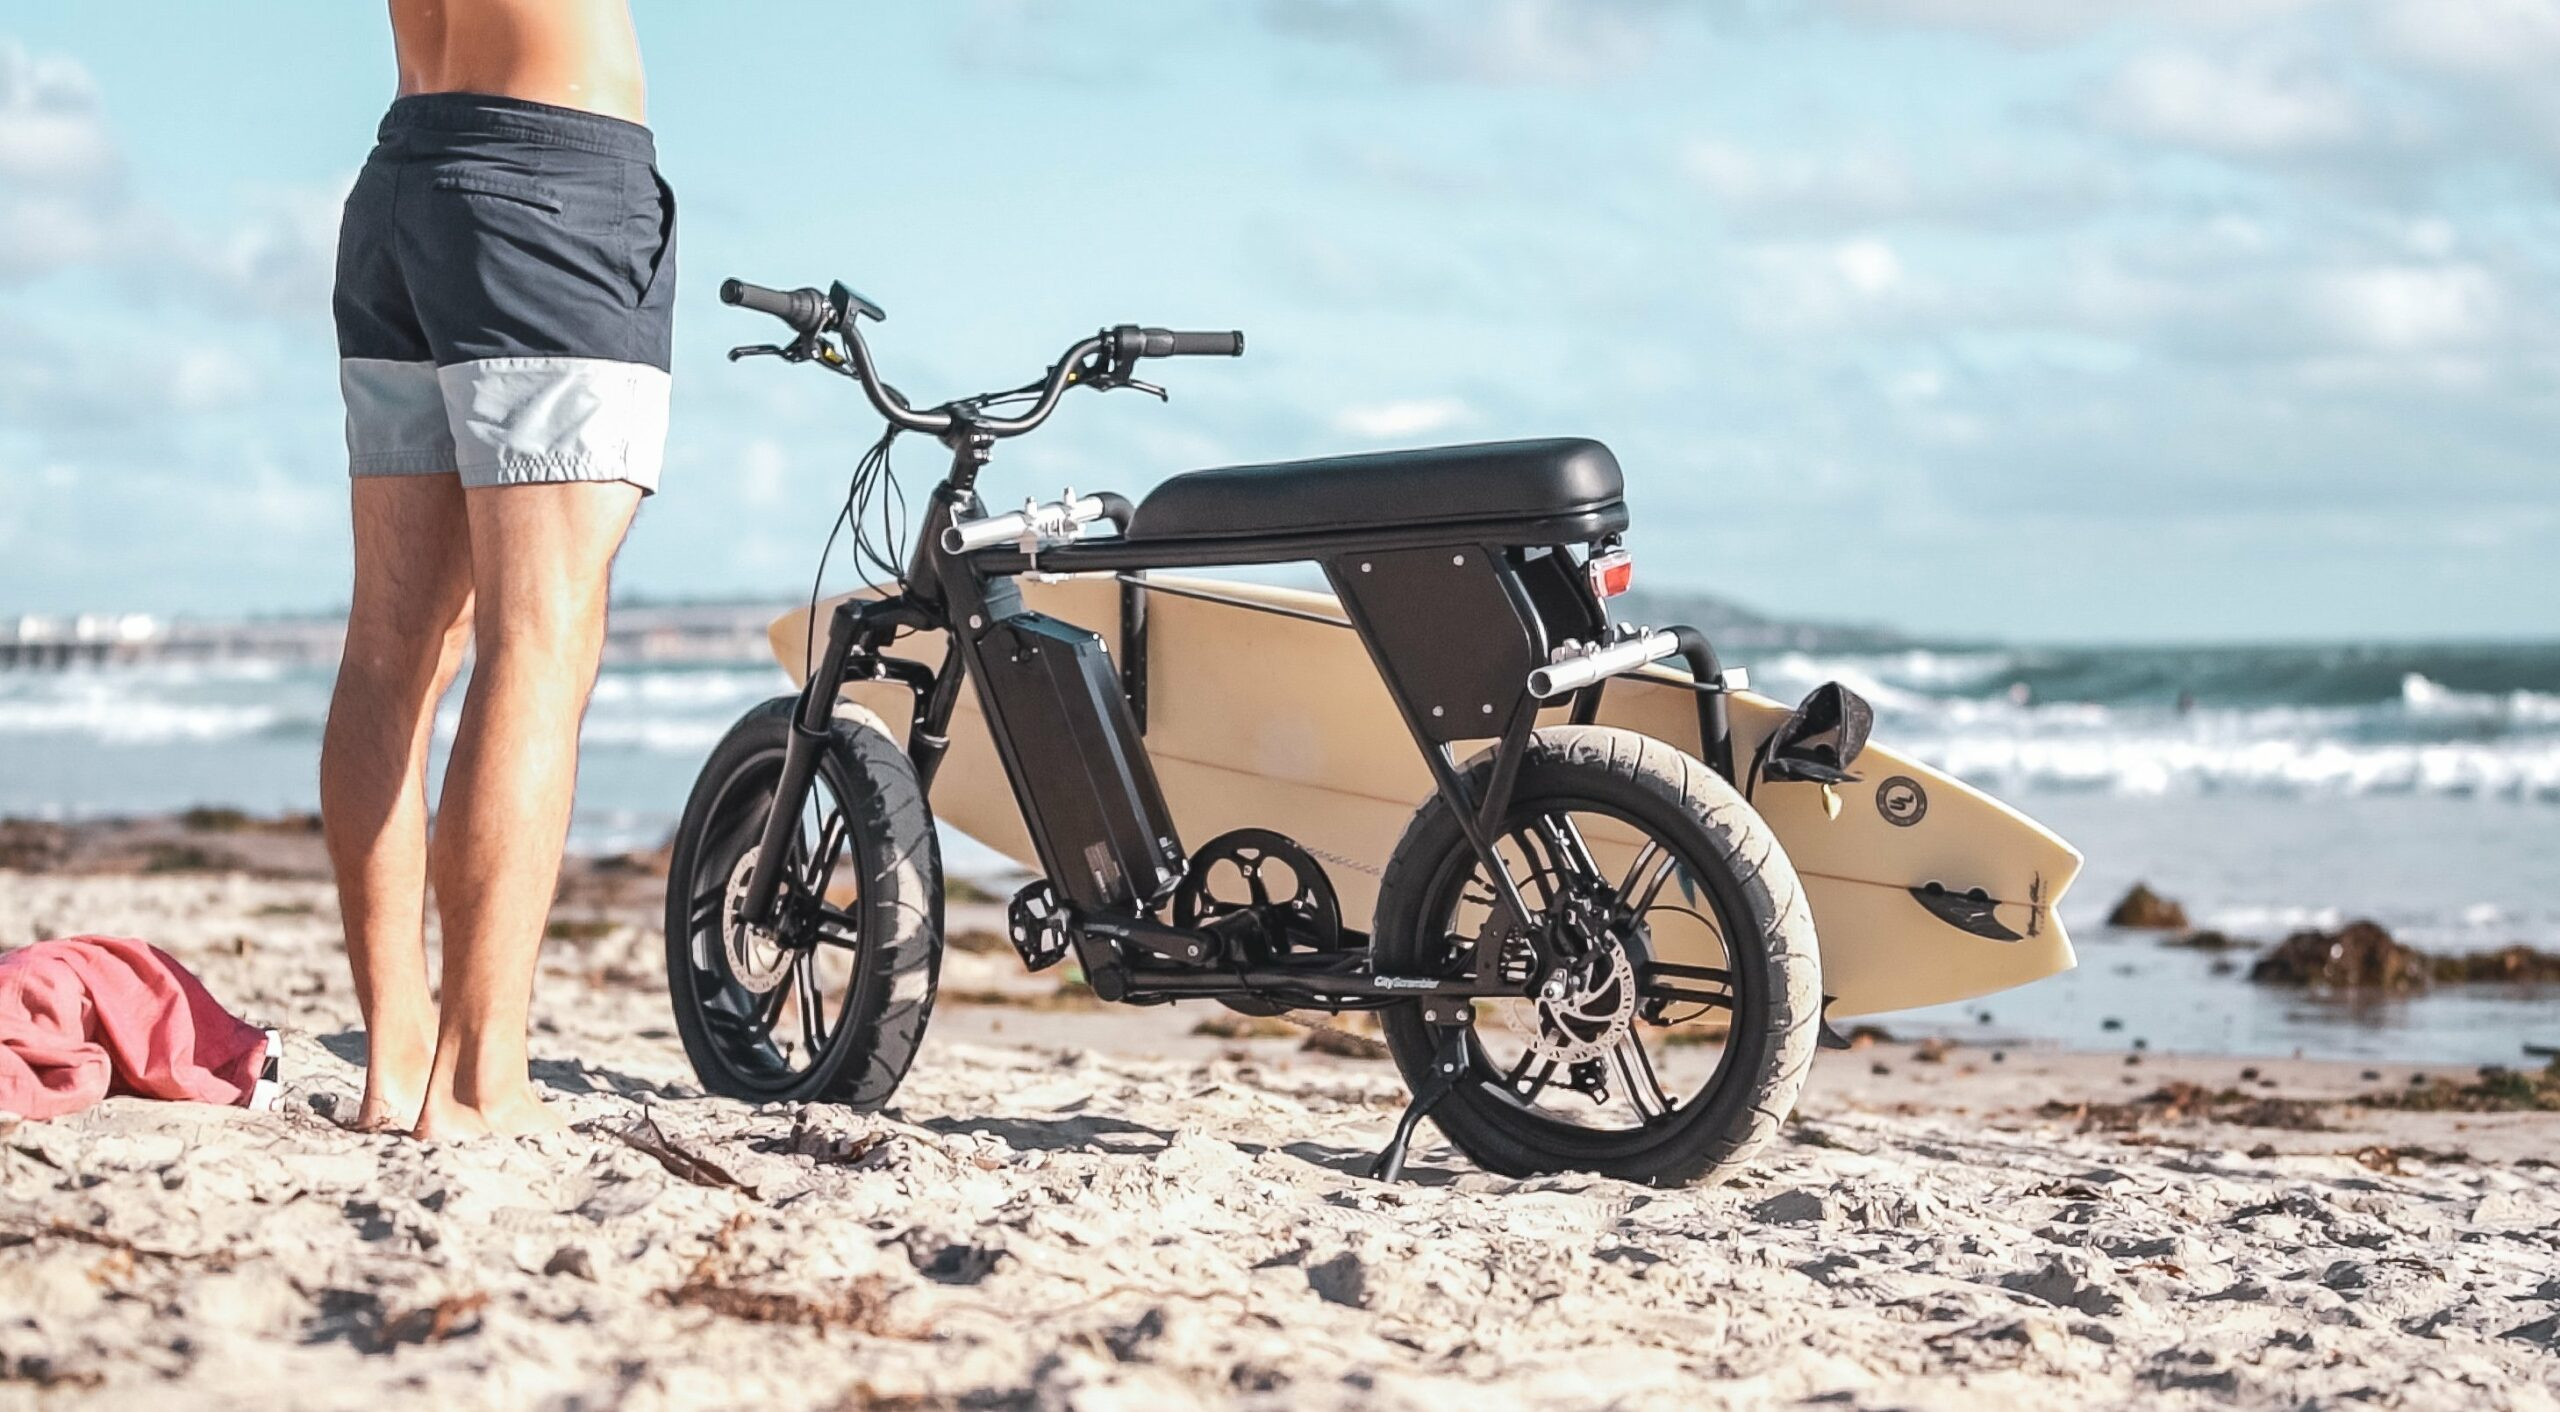 Juiced Bikes' Scrambler e-bike review